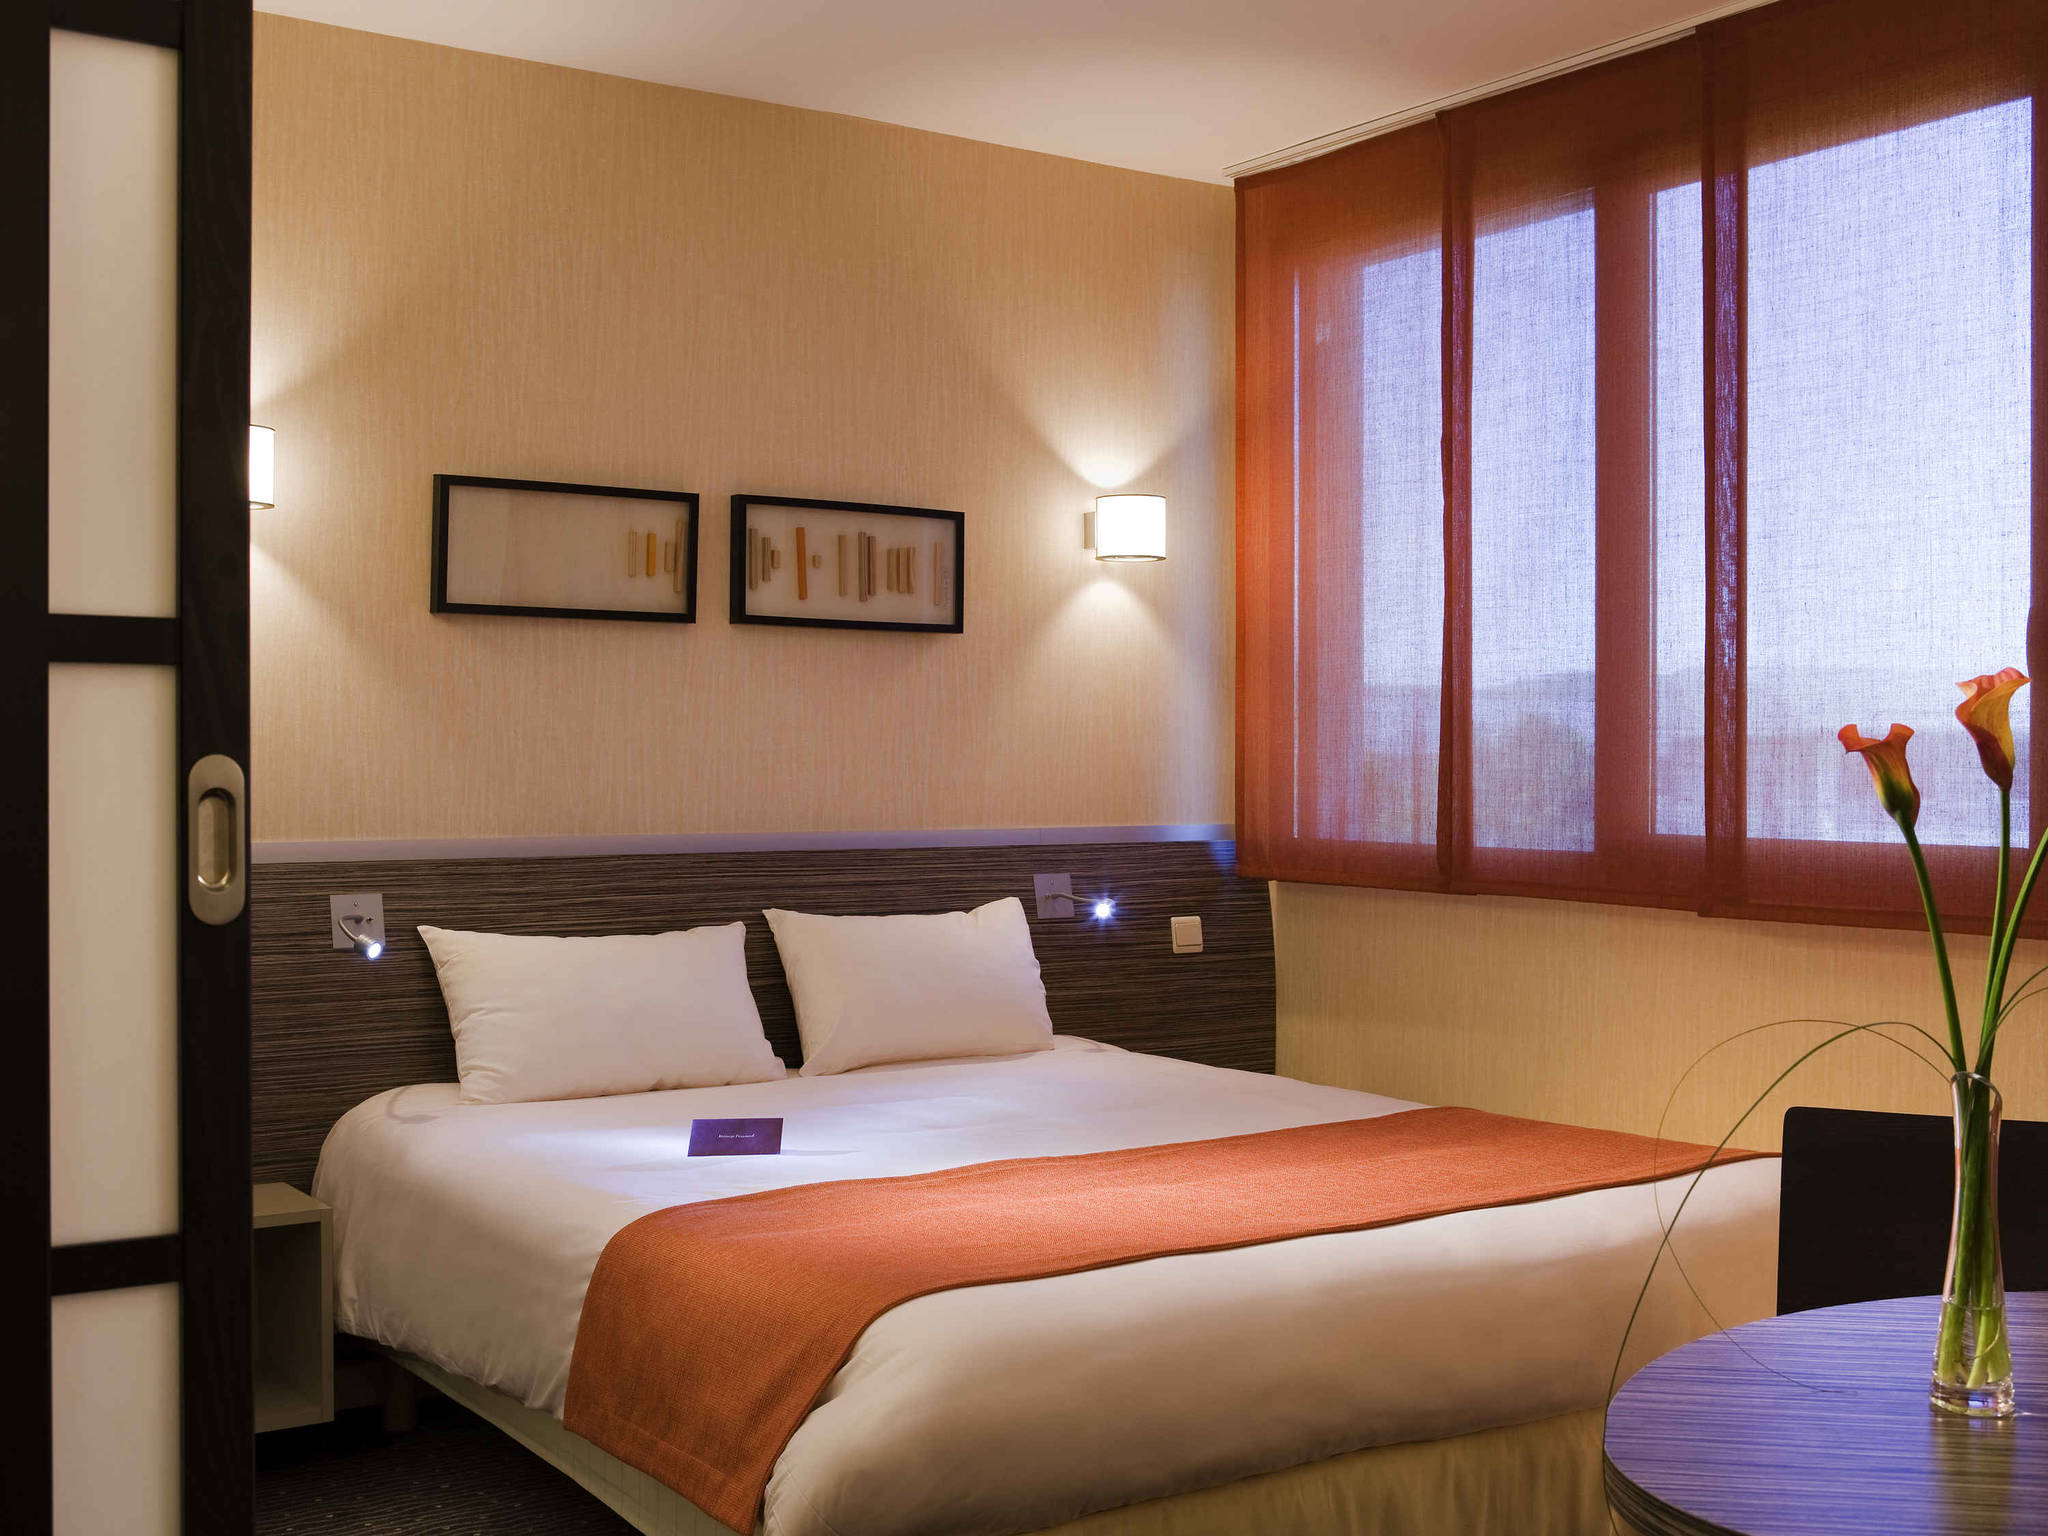 hotel in villefontaine mercure lyon l 39 isle d 39 abeau hotel. Black Bedroom Furniture Sets. Home Design Ideas